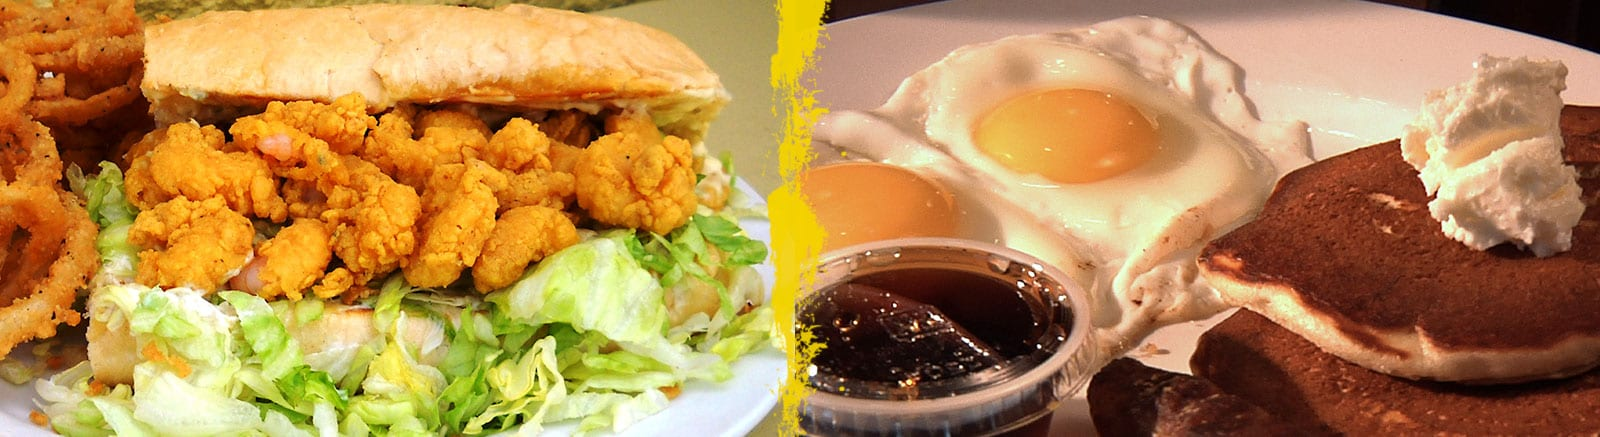 slider image of food